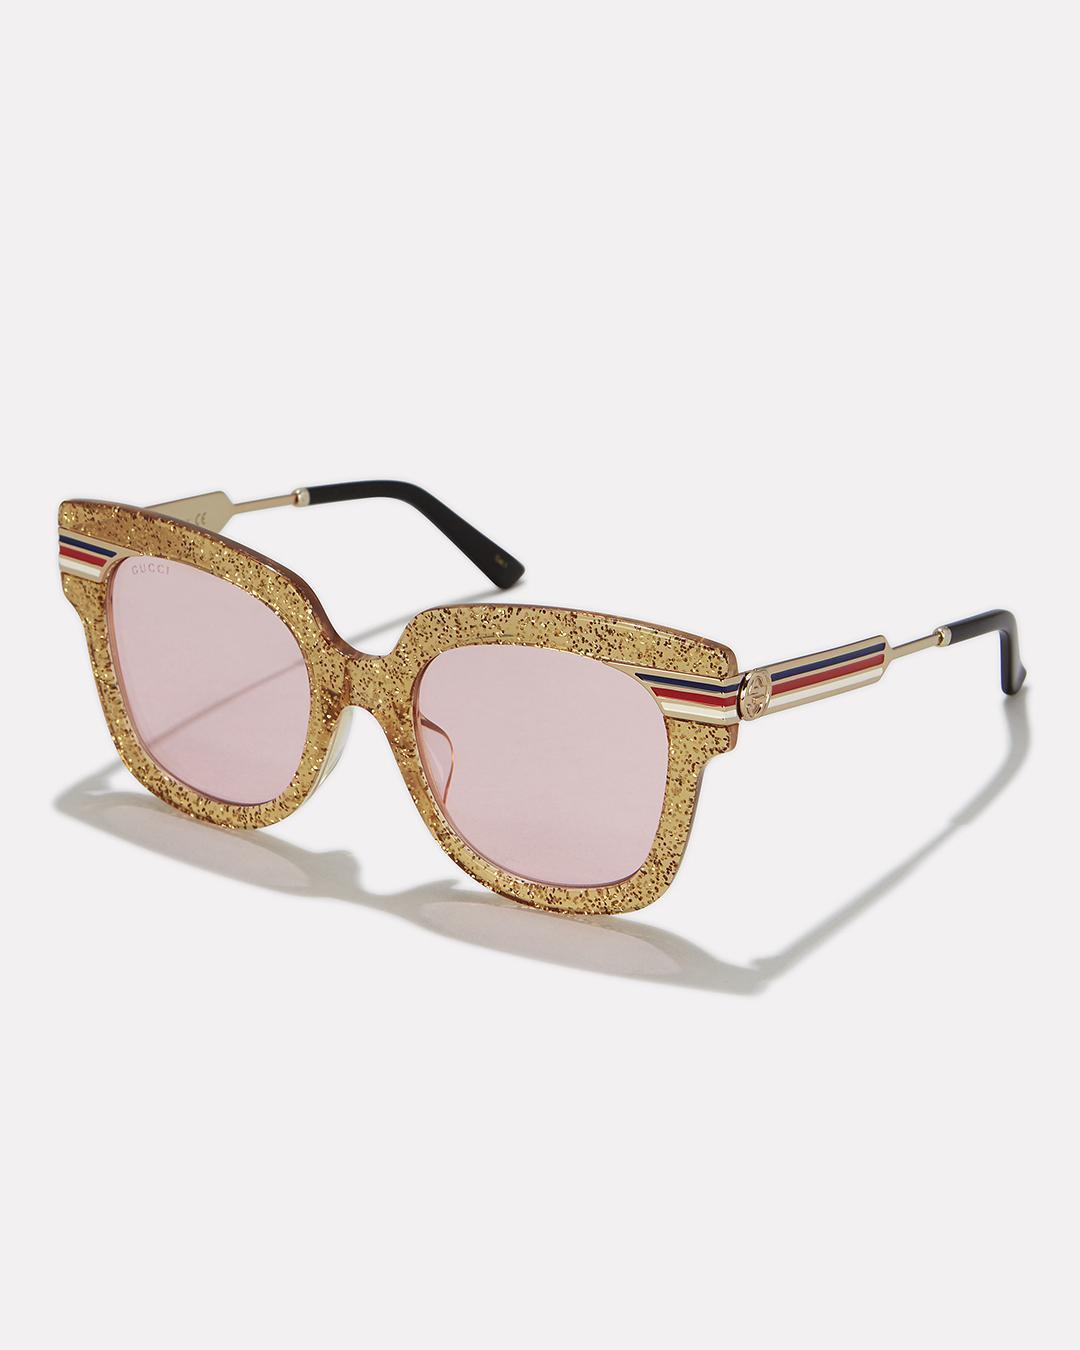 946576aa3bd3d Lyst - Gucci Gold Glitter Pink Lens Sunglasses in Metallic